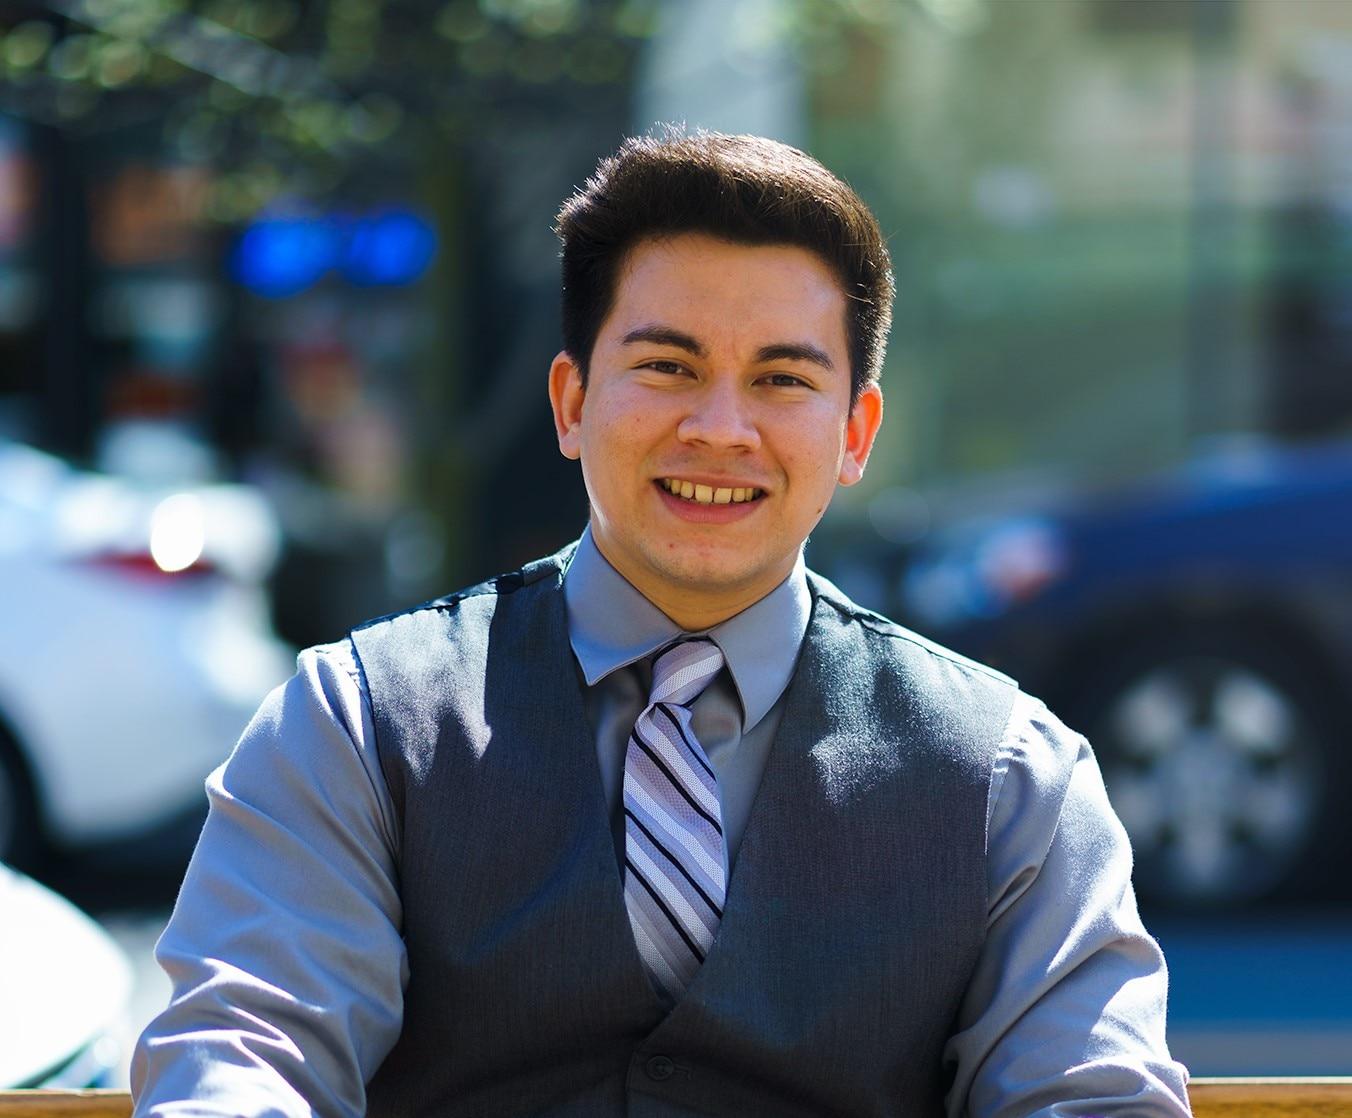 JUAN CAMILO GIRALDO SANCHEZ  Your Financial Professional & Insurance Agent